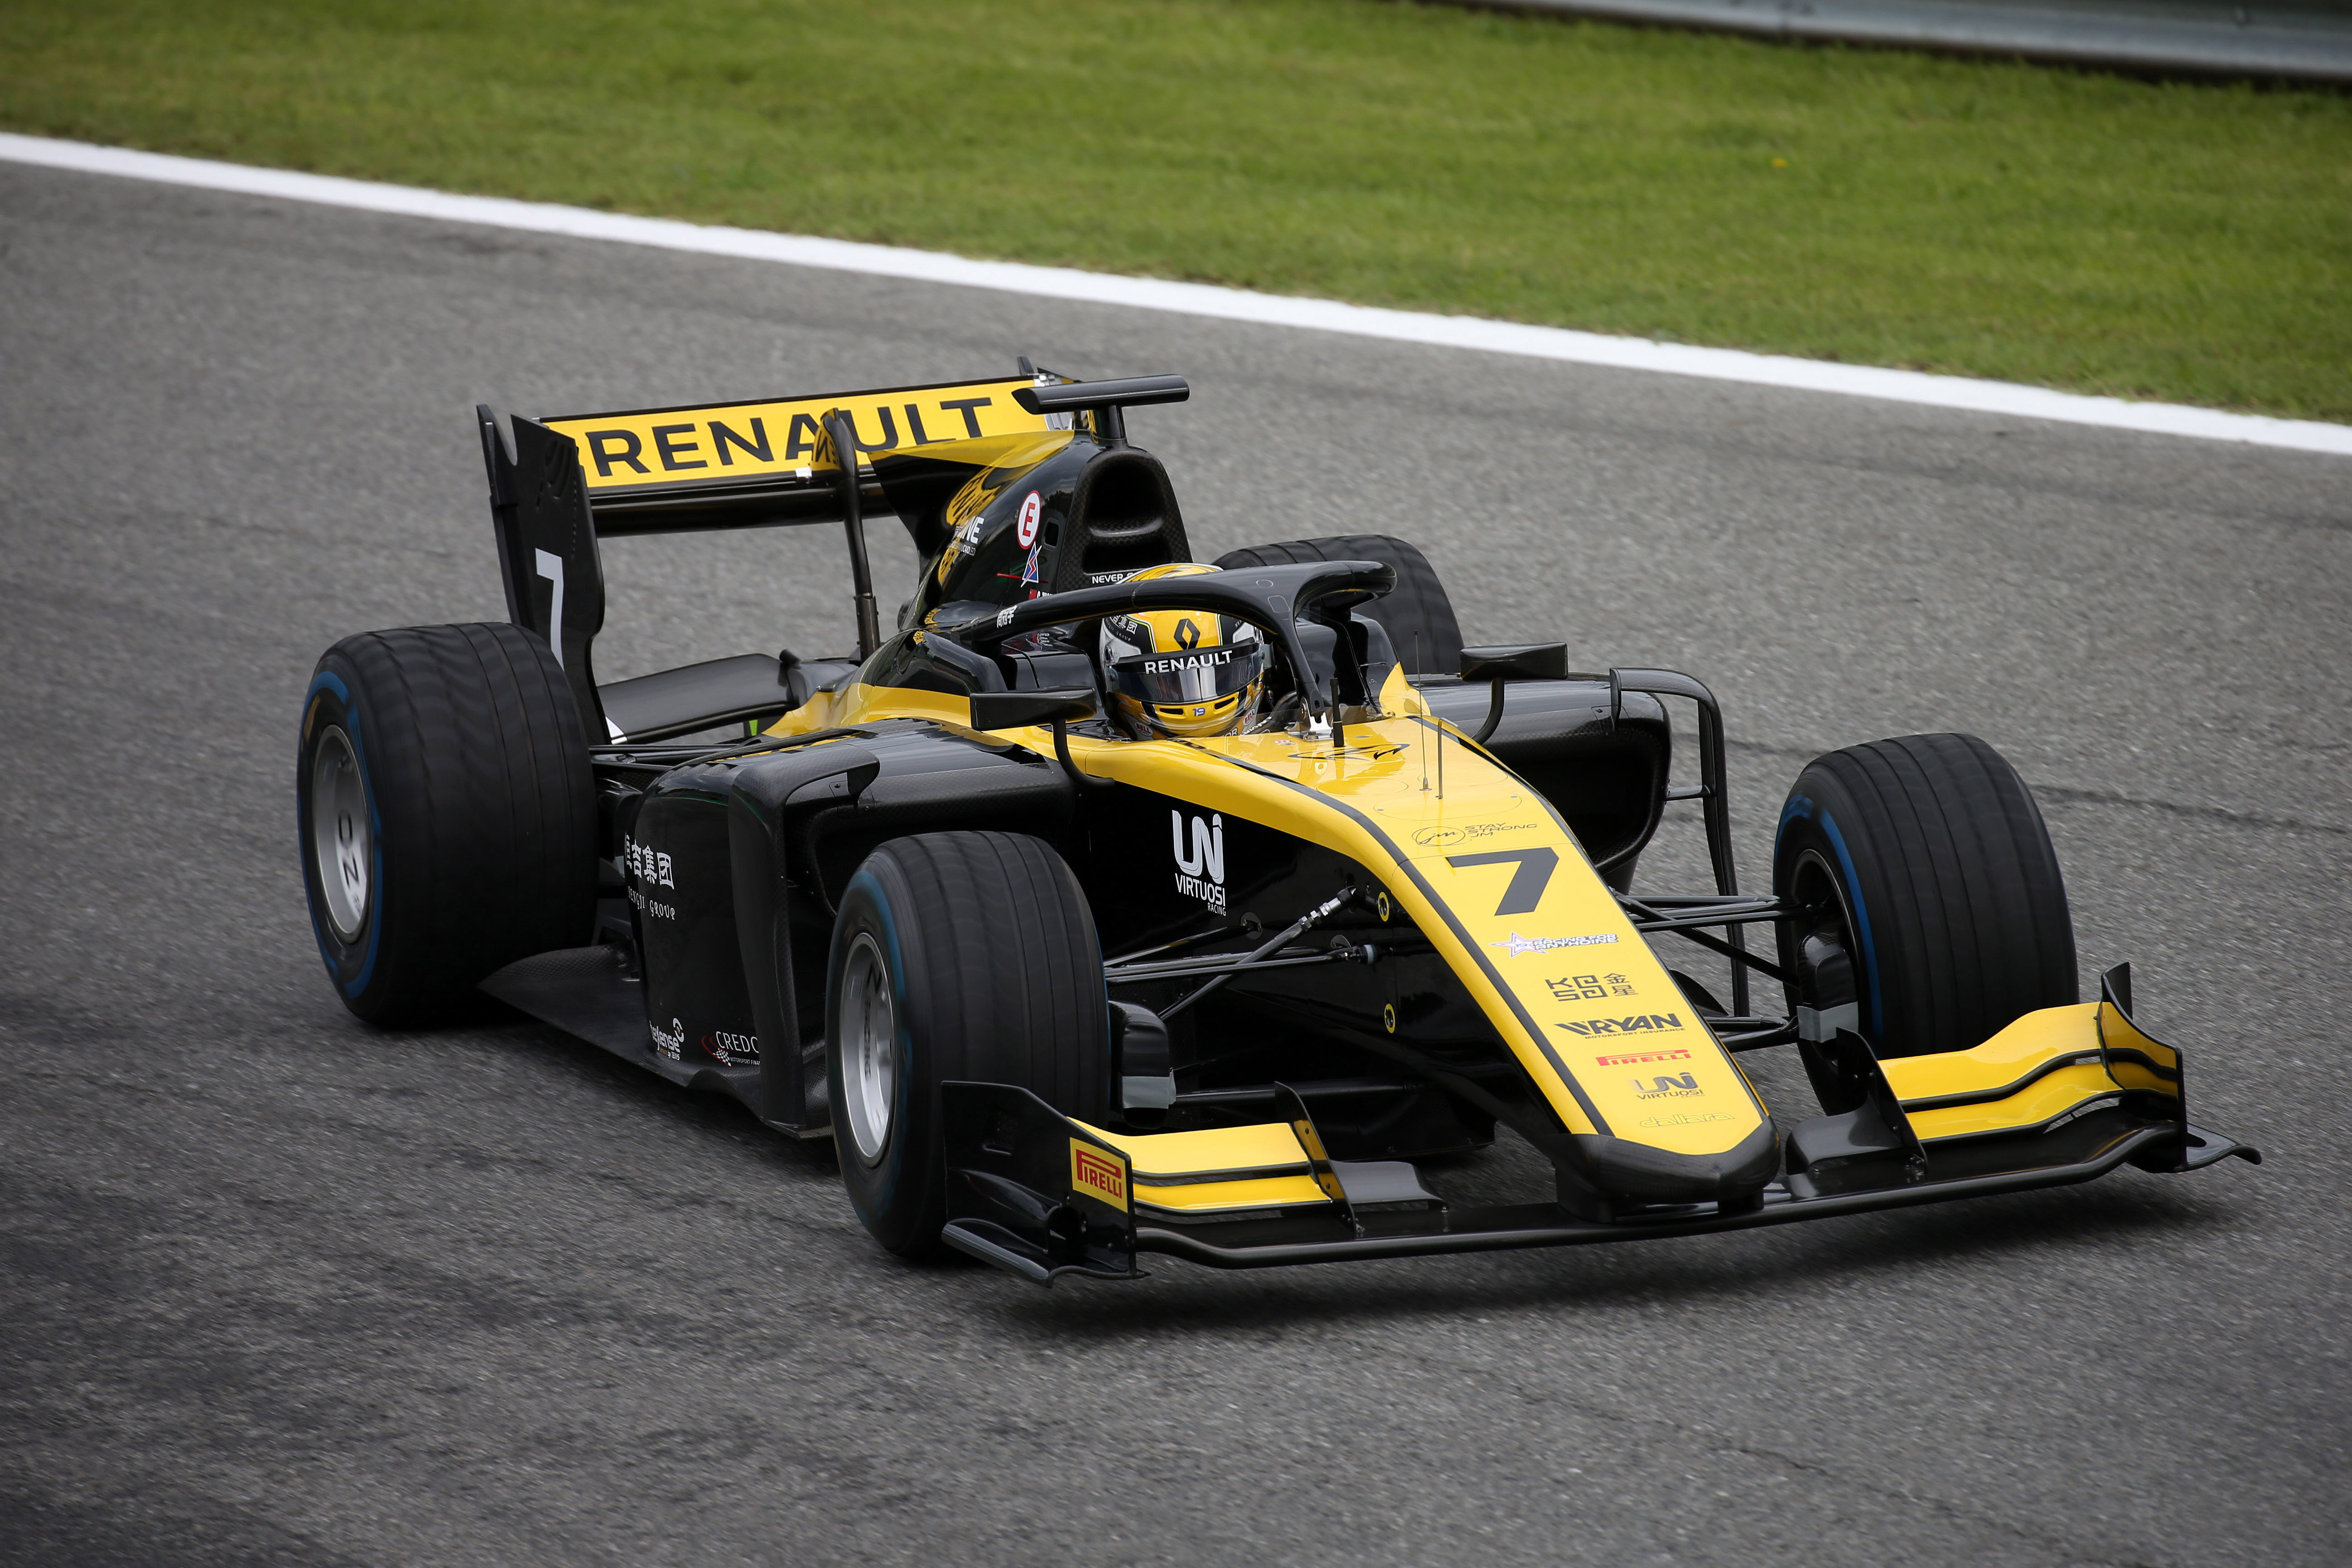 Motor Racing Fia Formula 2 Championship Friday Monza, Italy